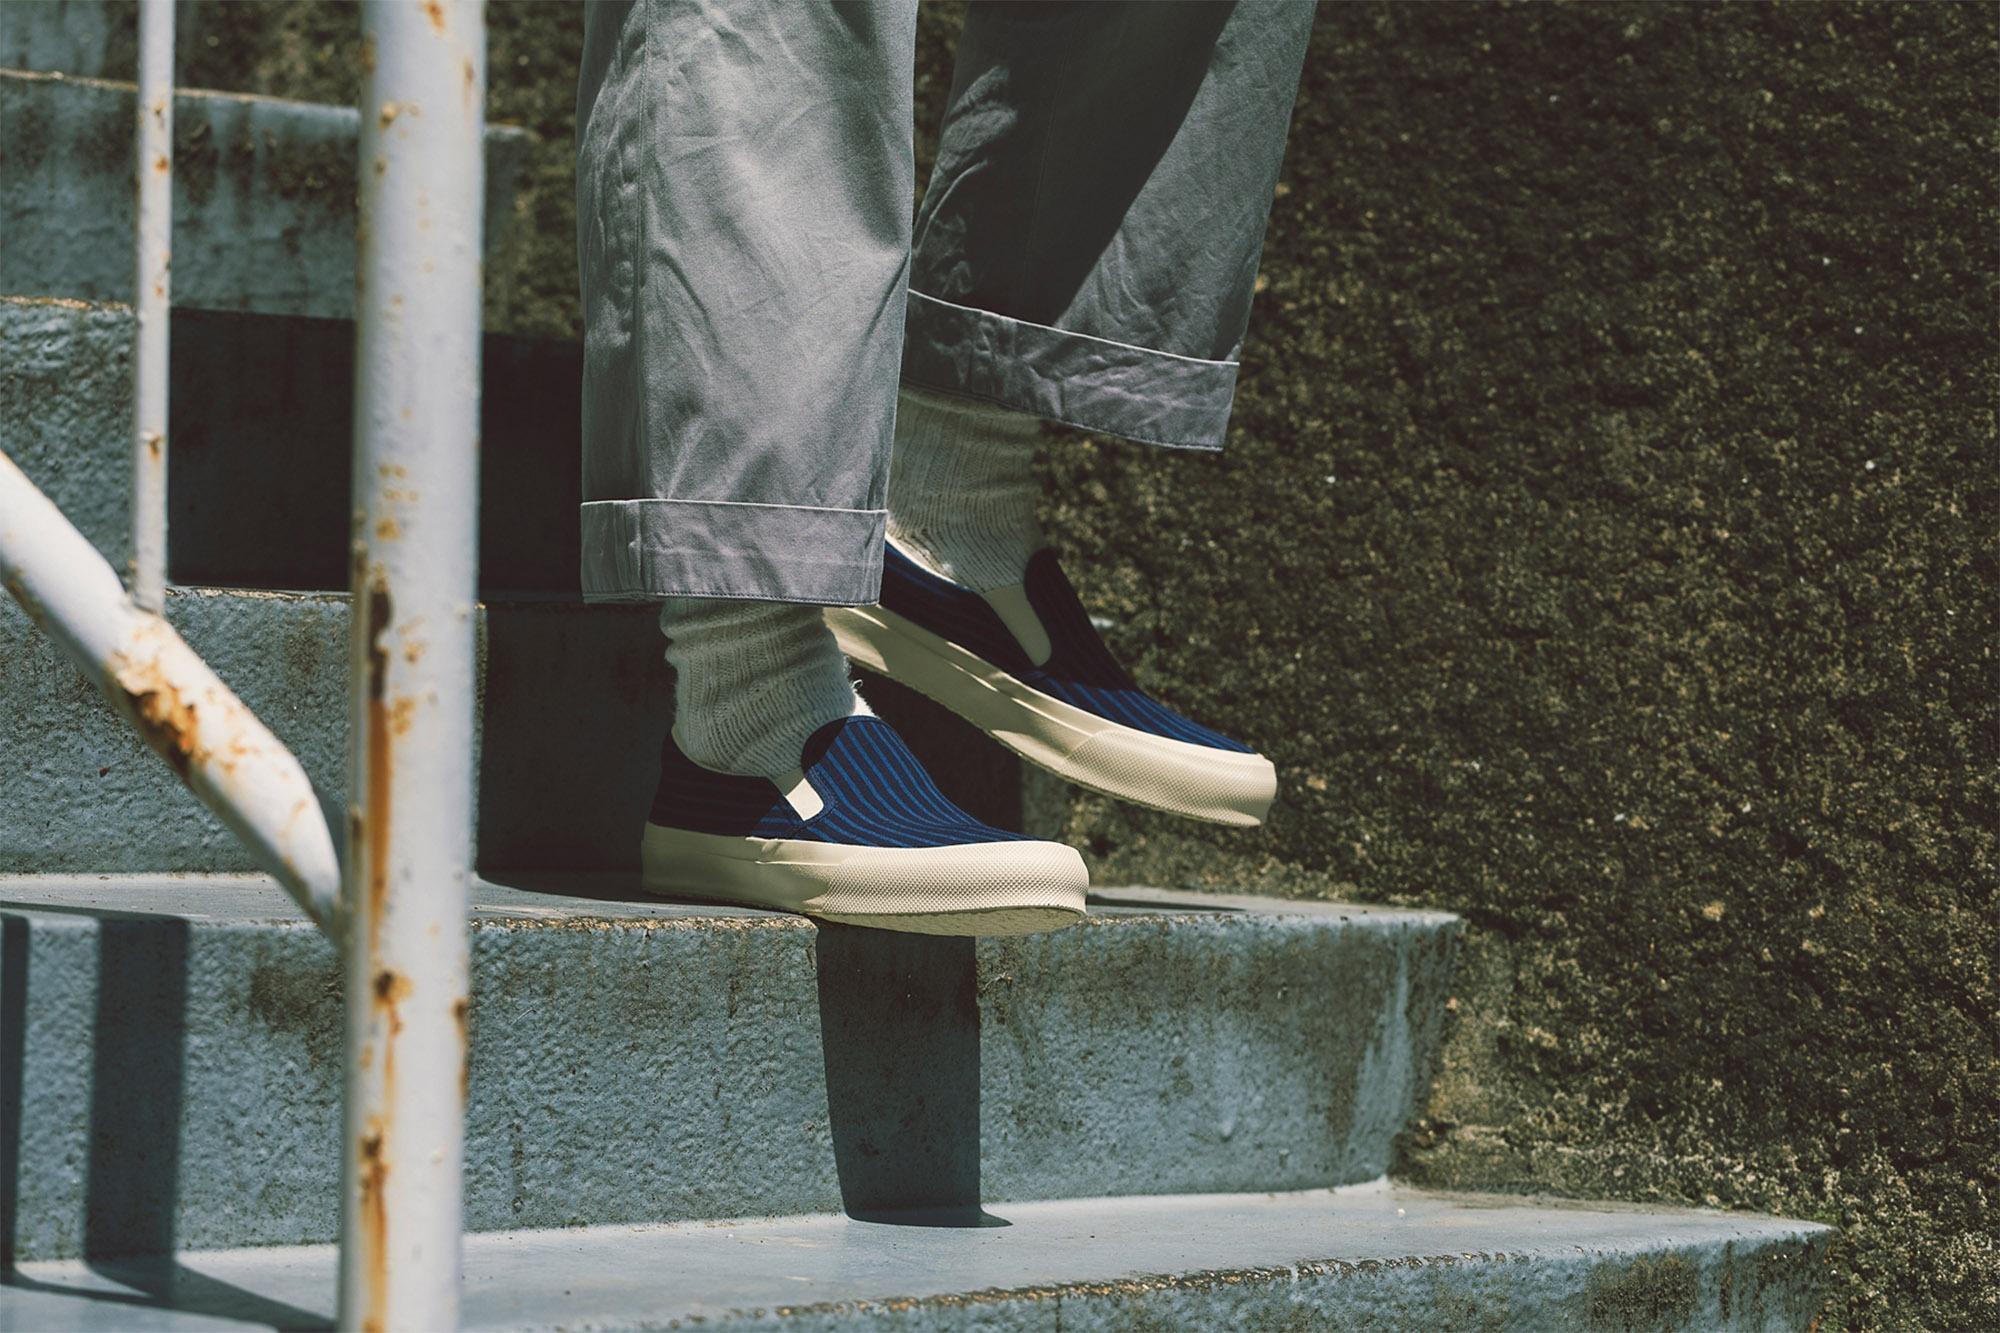 Doek Shoes Slip-on (Source : Doek)